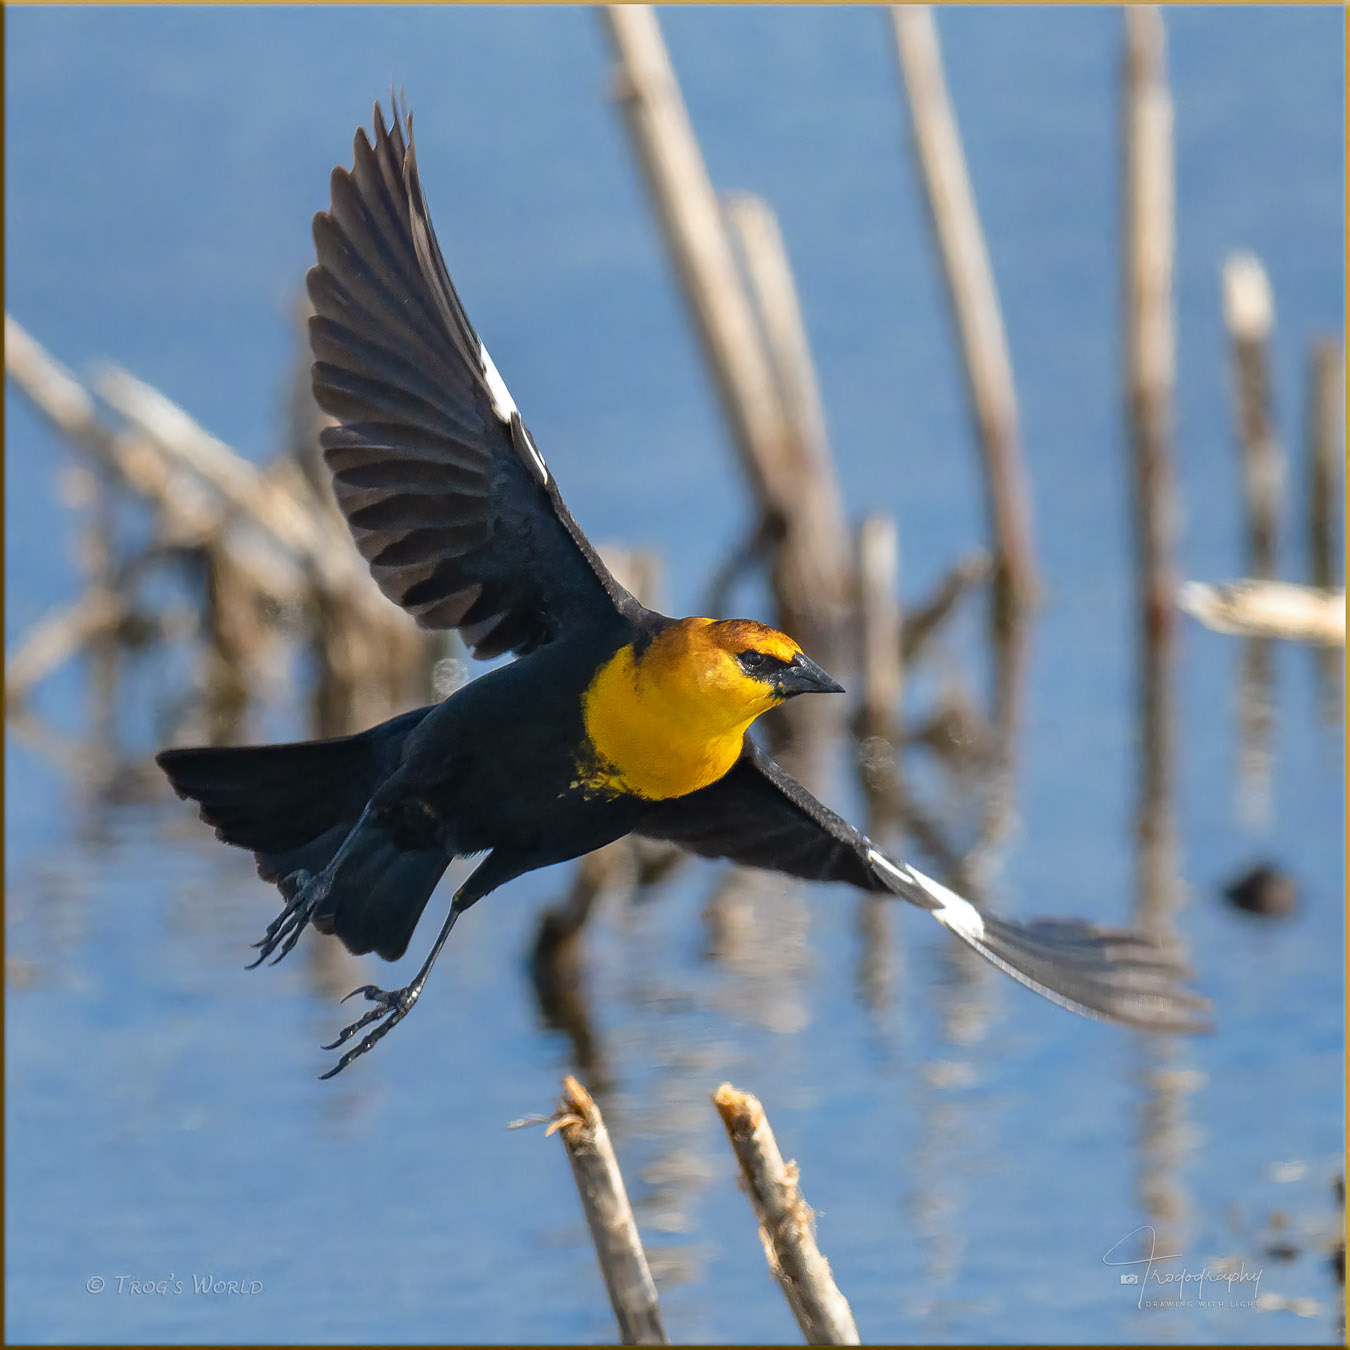 Yellow-headed Blackbird taking flight